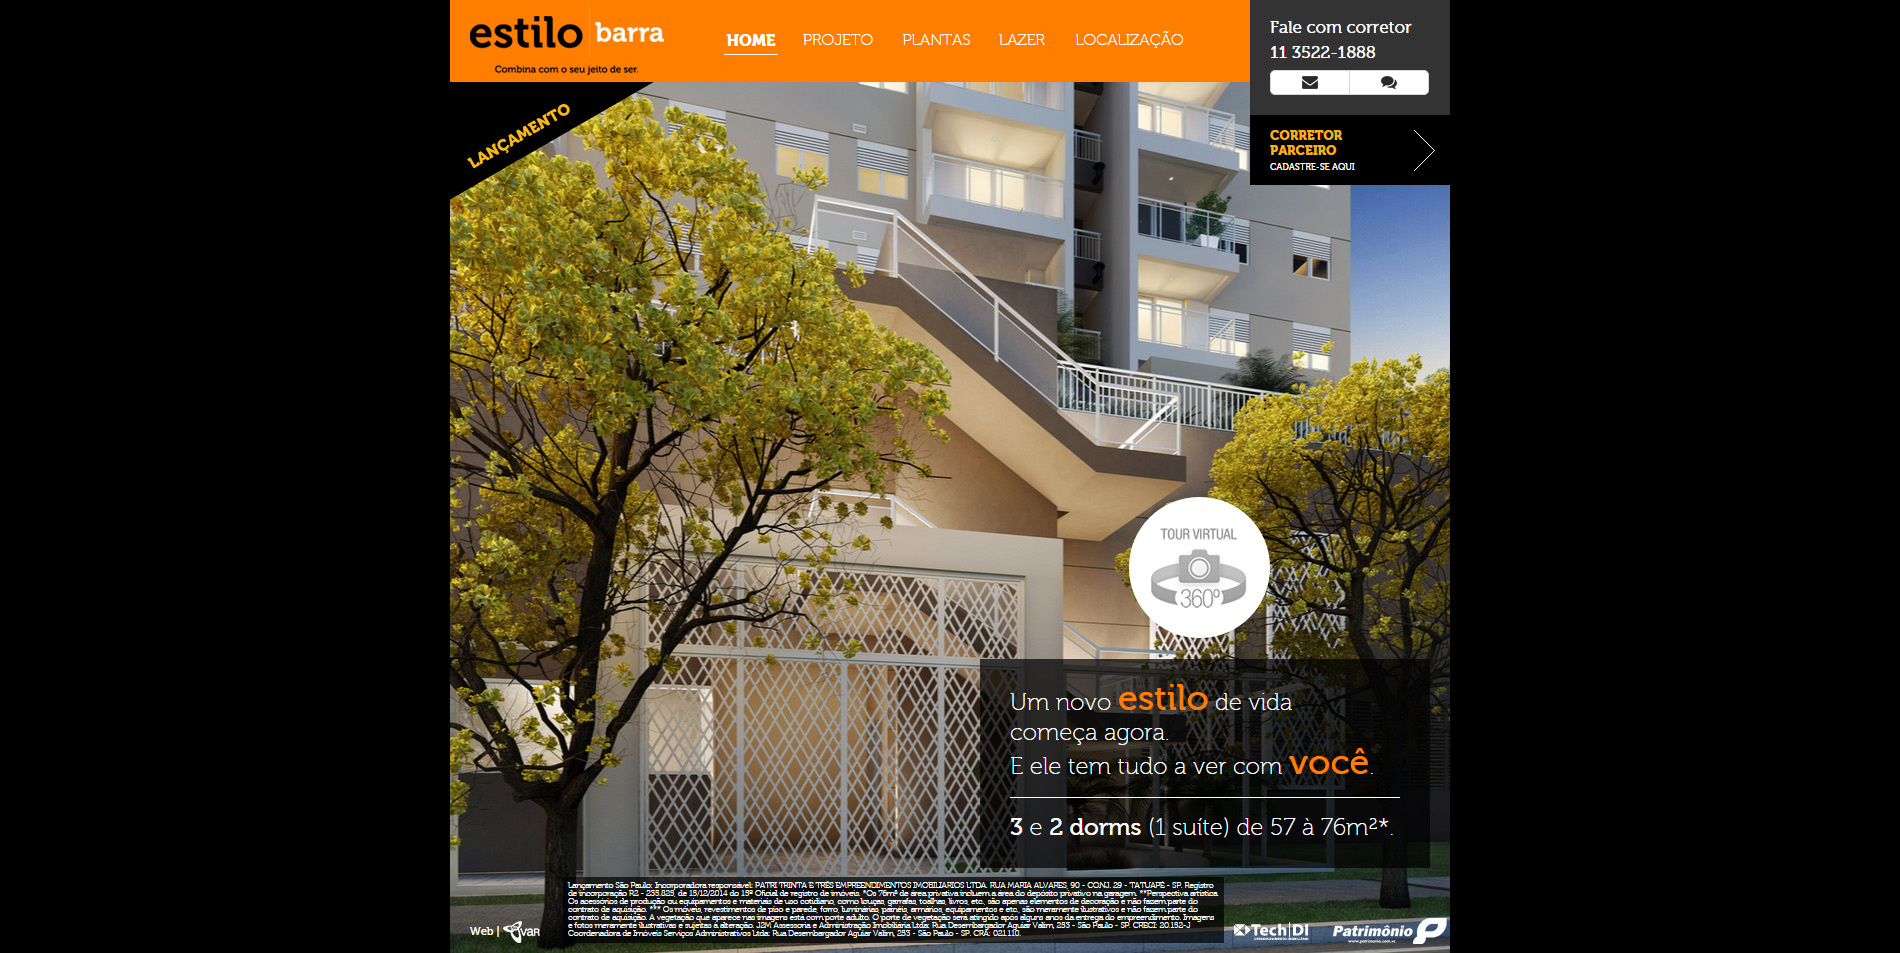 Hotsites-Estilo Barra